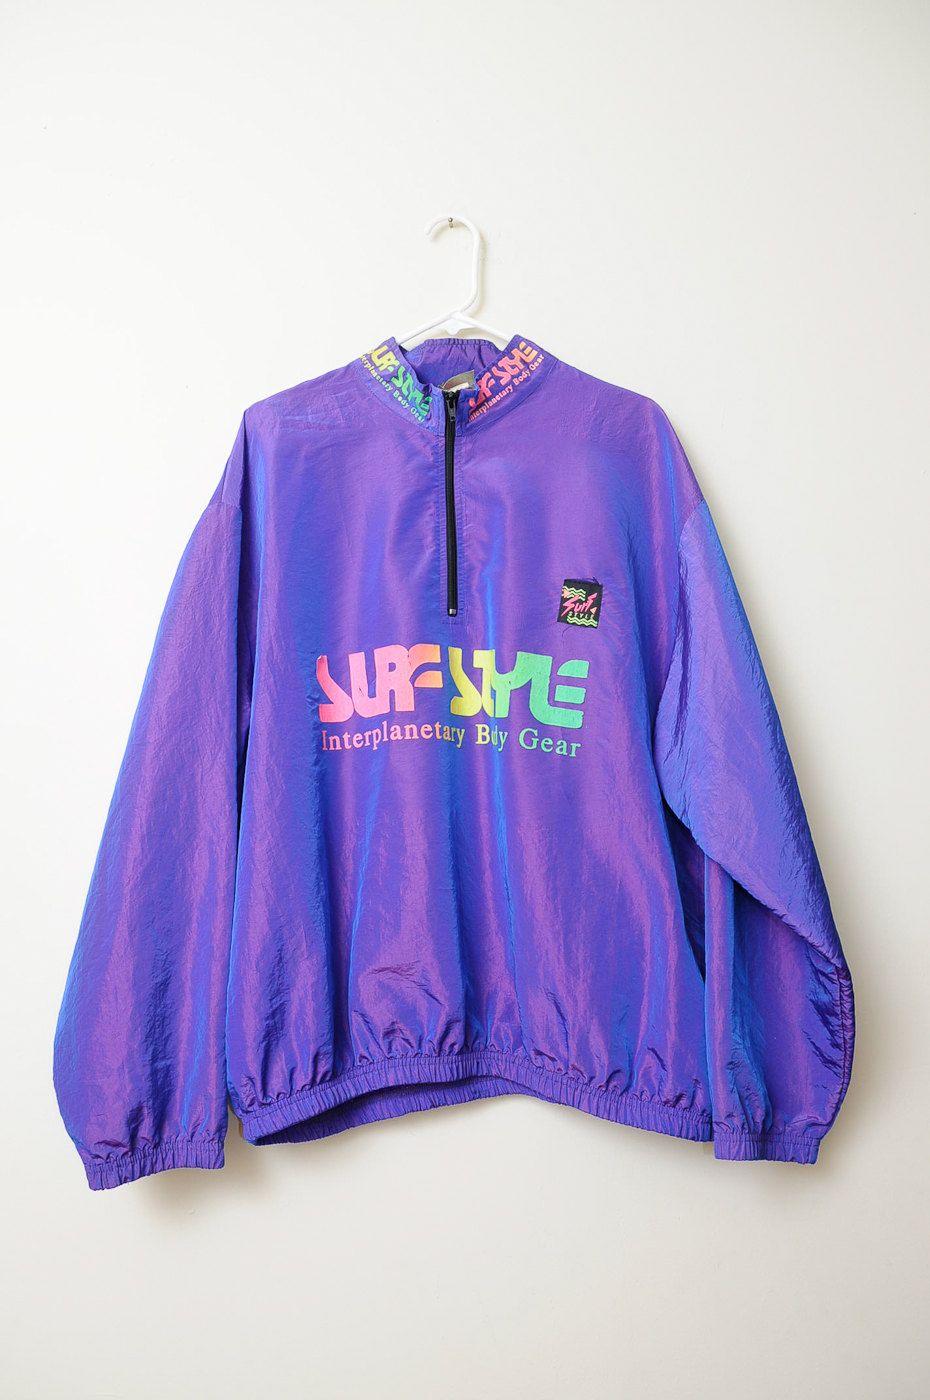 Vintage 80s/90s Neon Surf Style Pullover Windbreaker Jacket ...